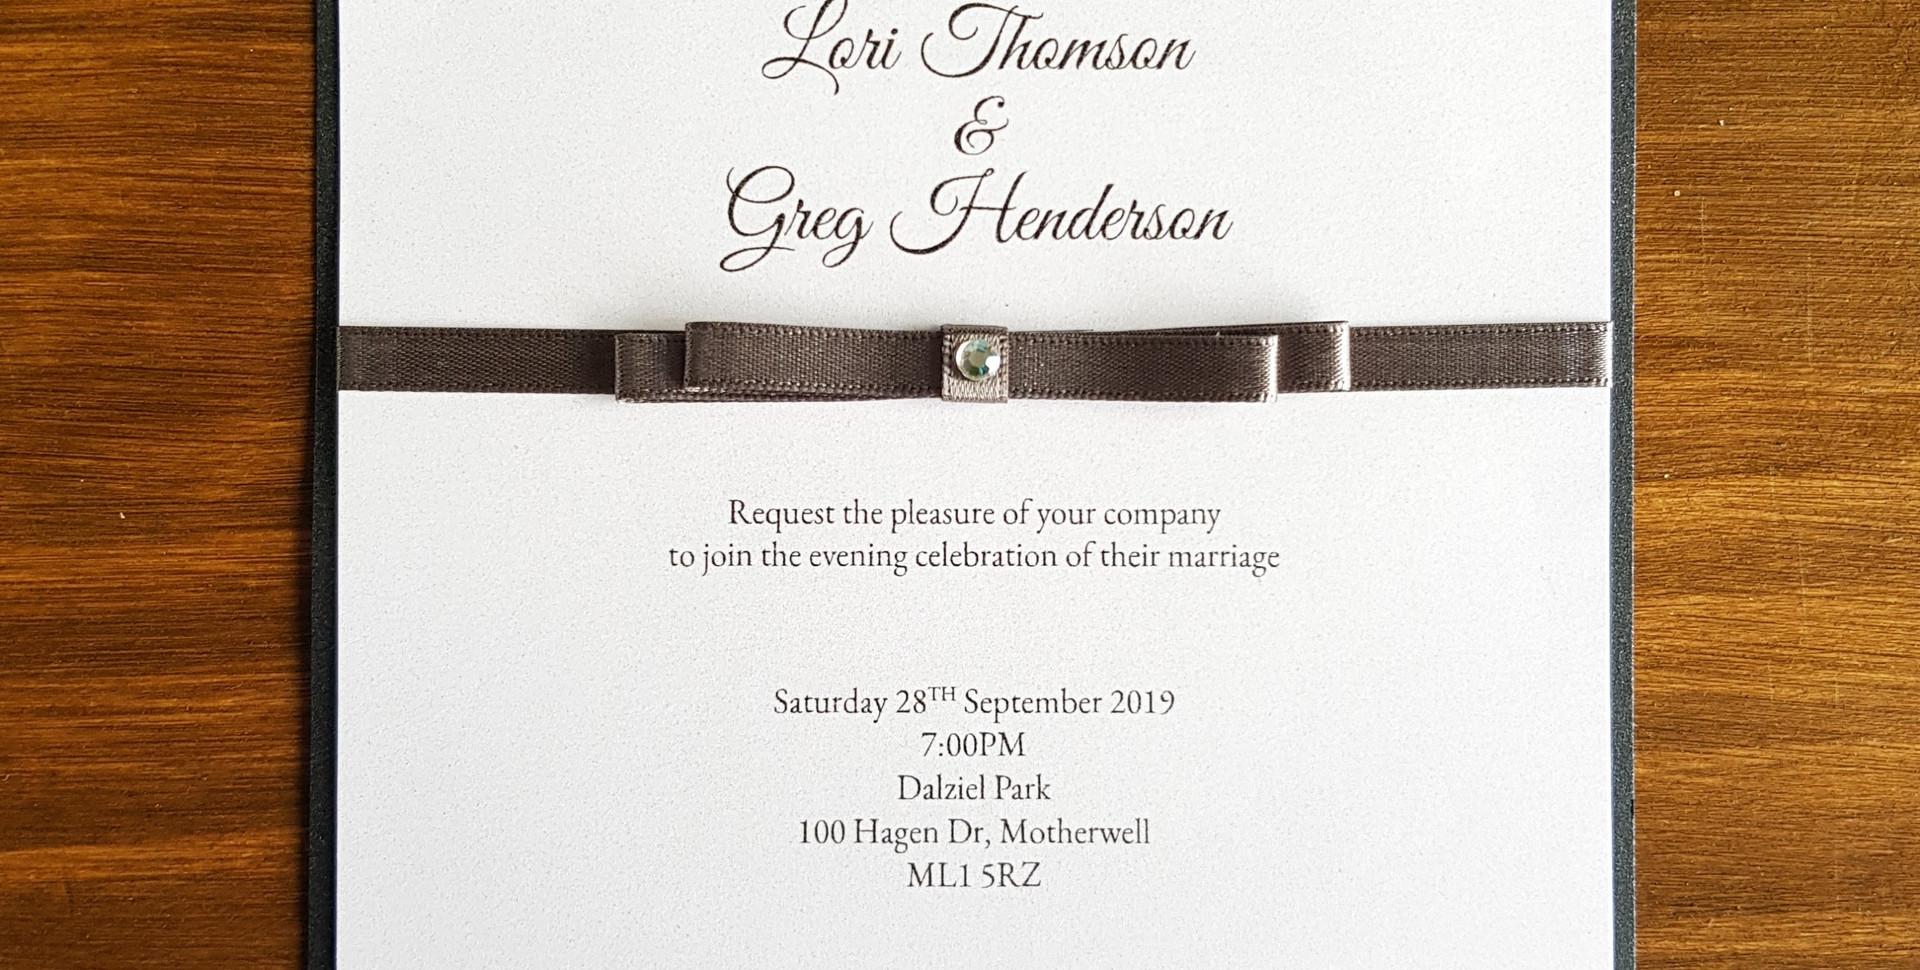 Lori - Evening wedding invitation